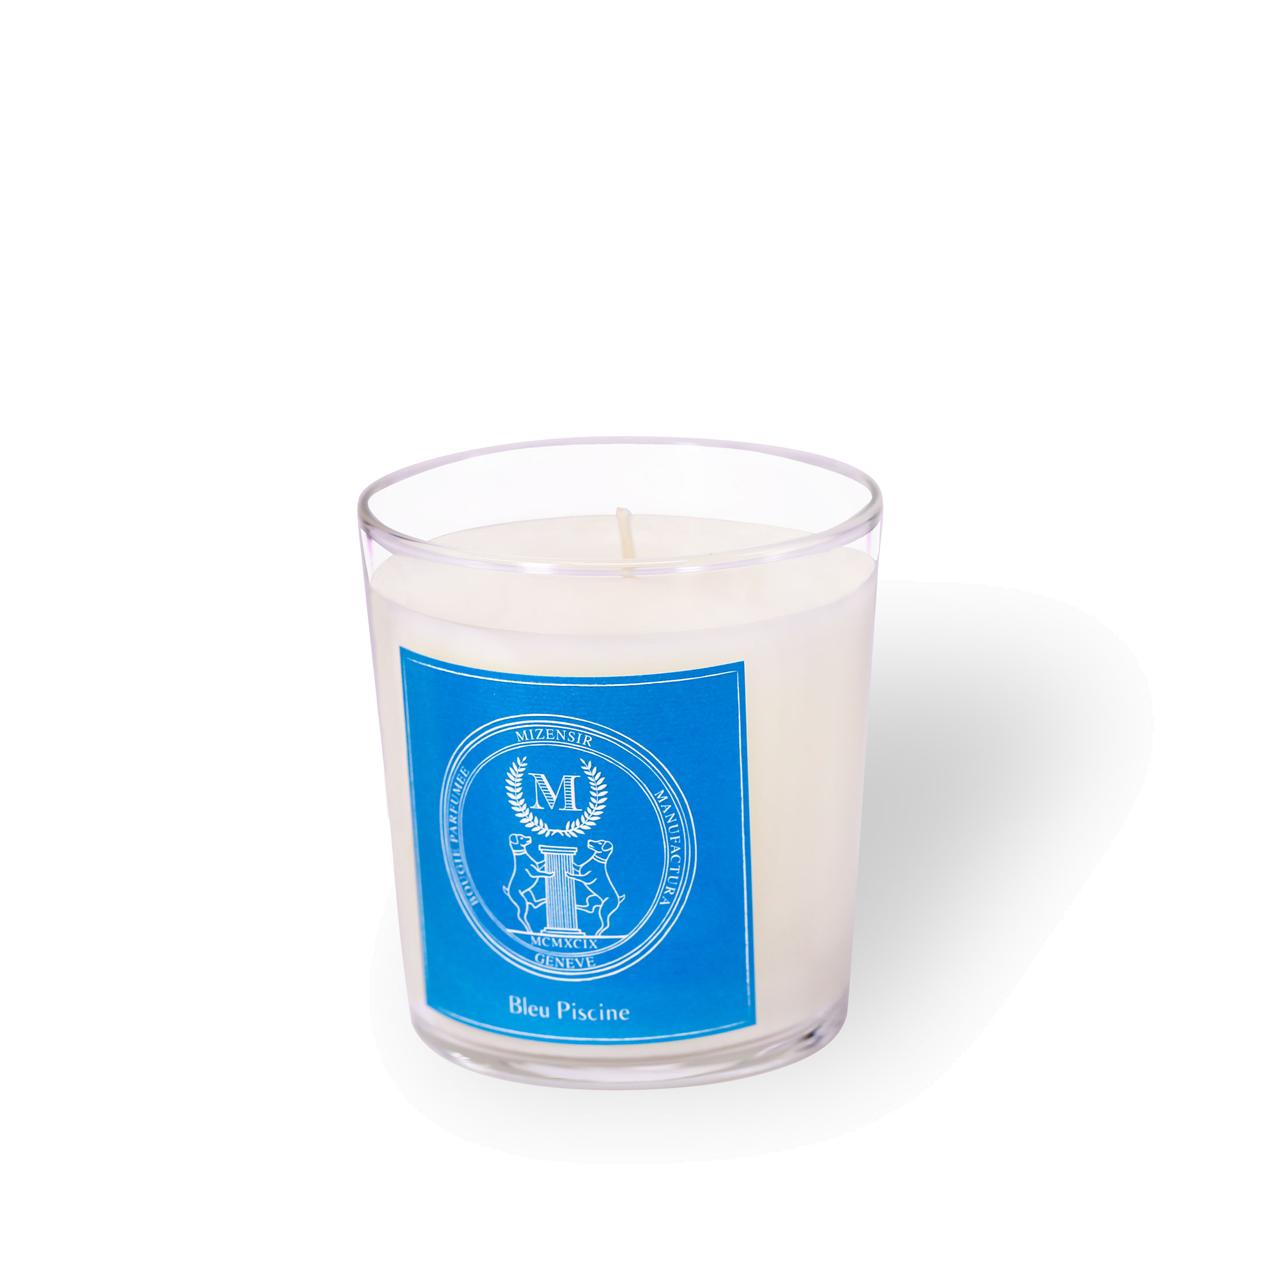 Bleu Piscine - Candle